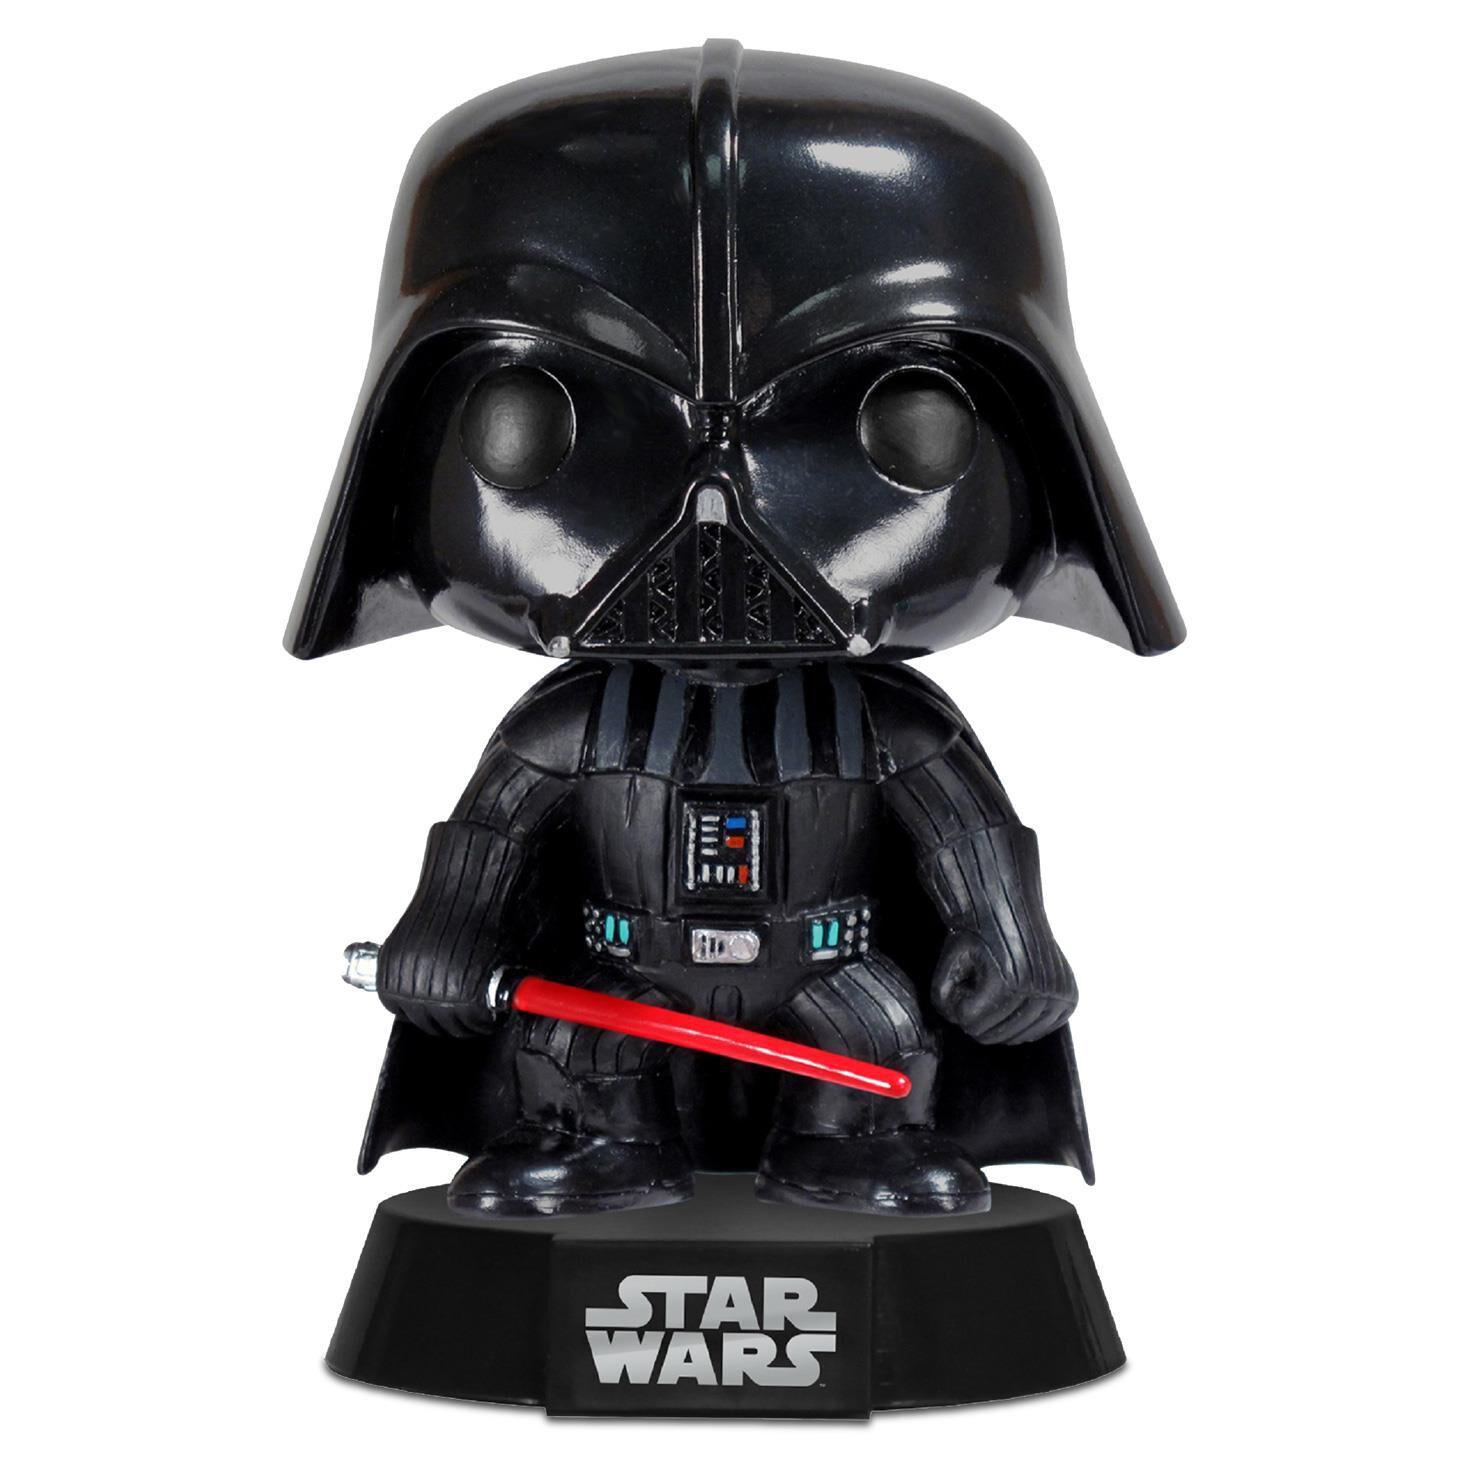 Darth Vader Bobblehead  Collectible Toys  Hallmark